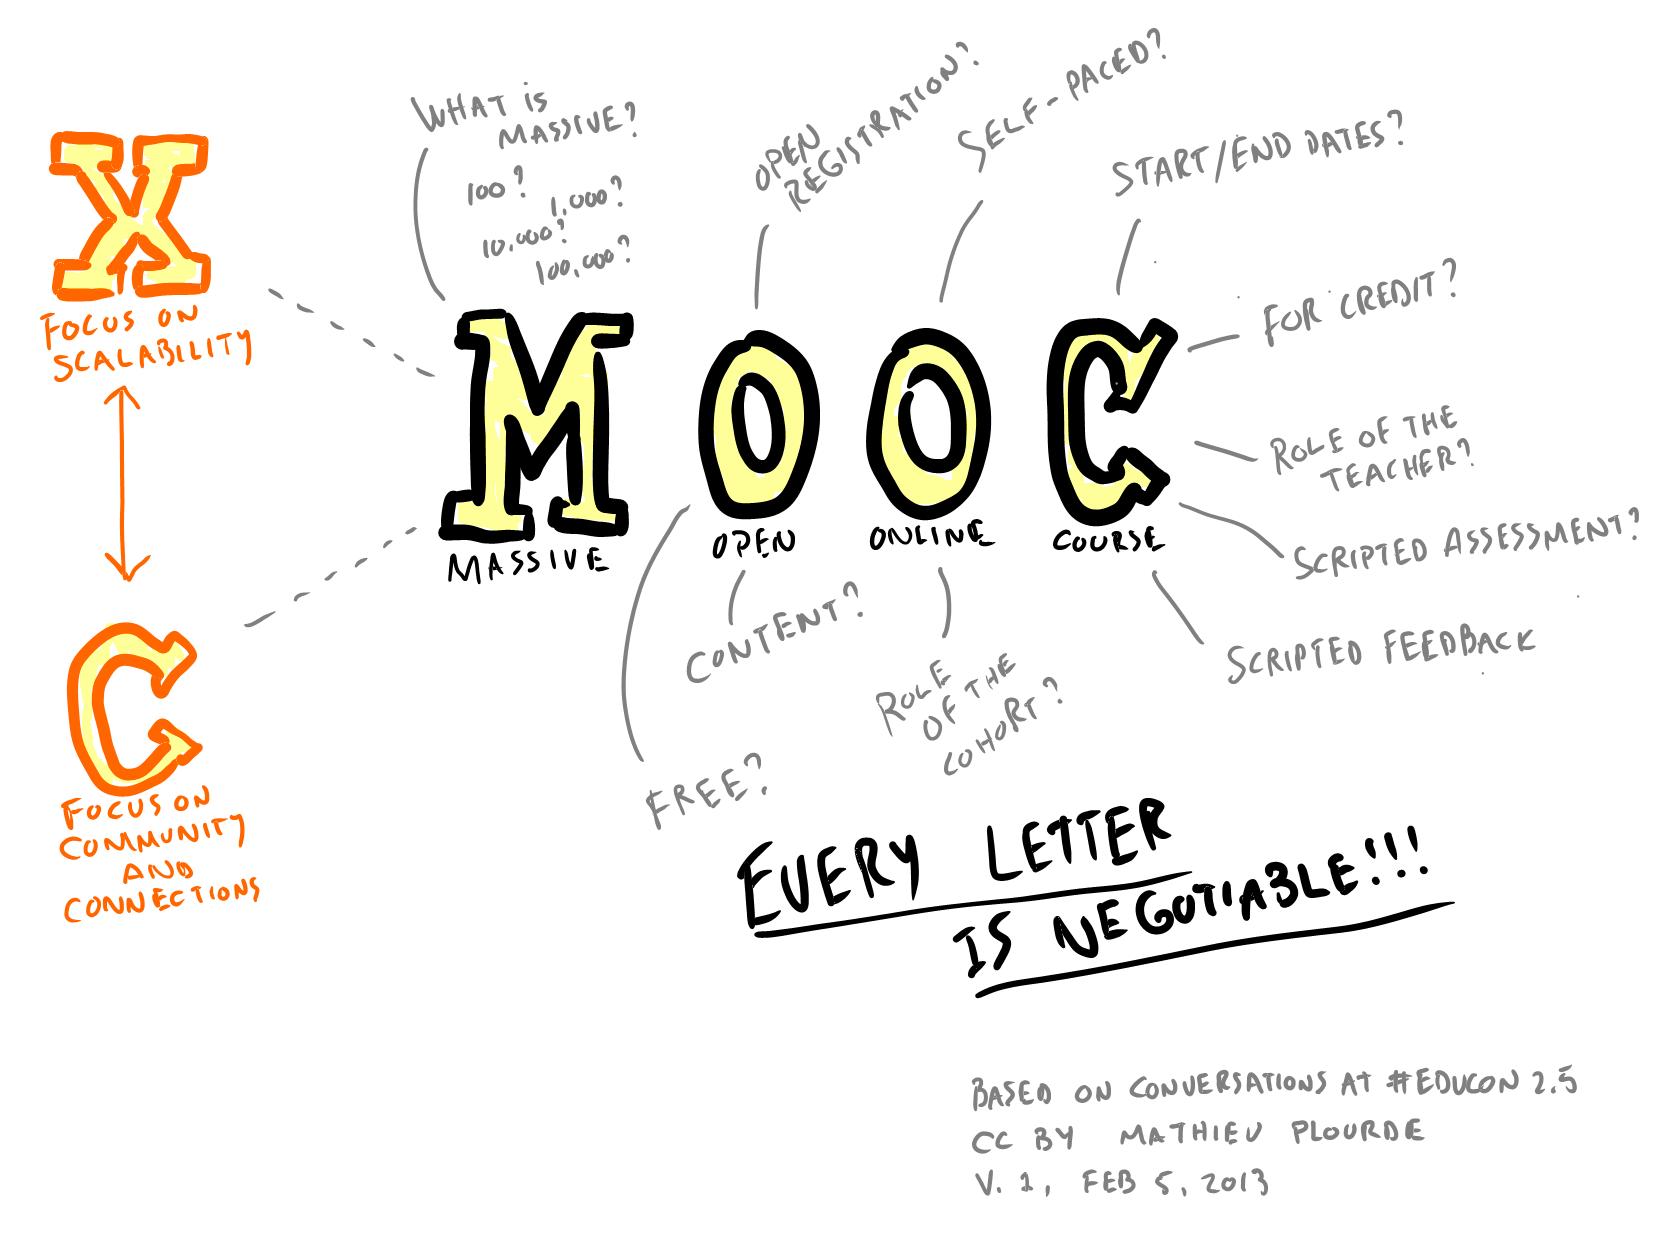 moocquest